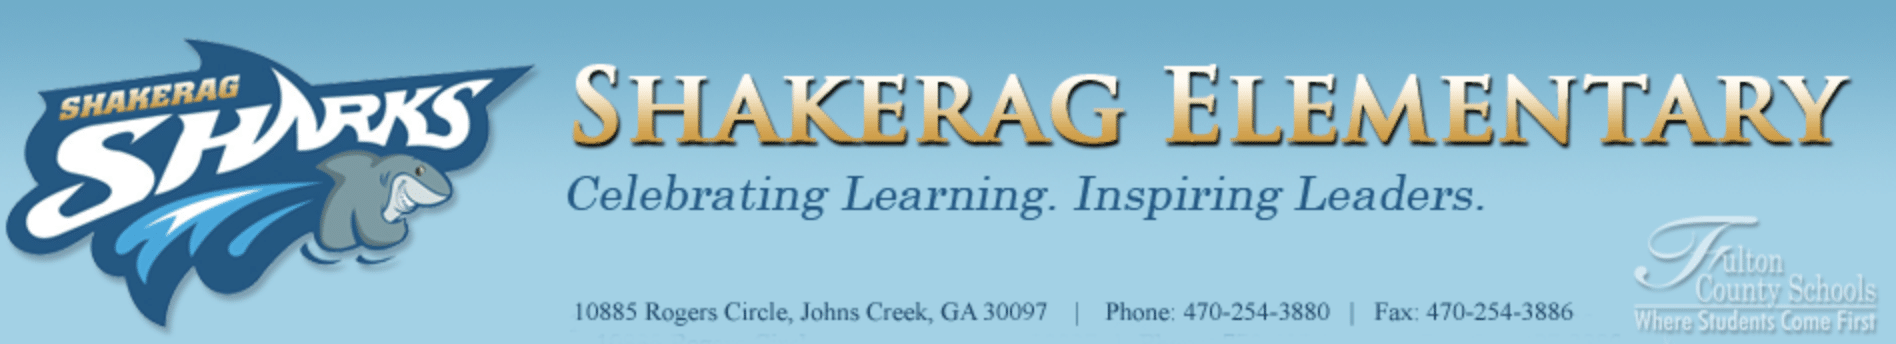 Shakerag-elementary